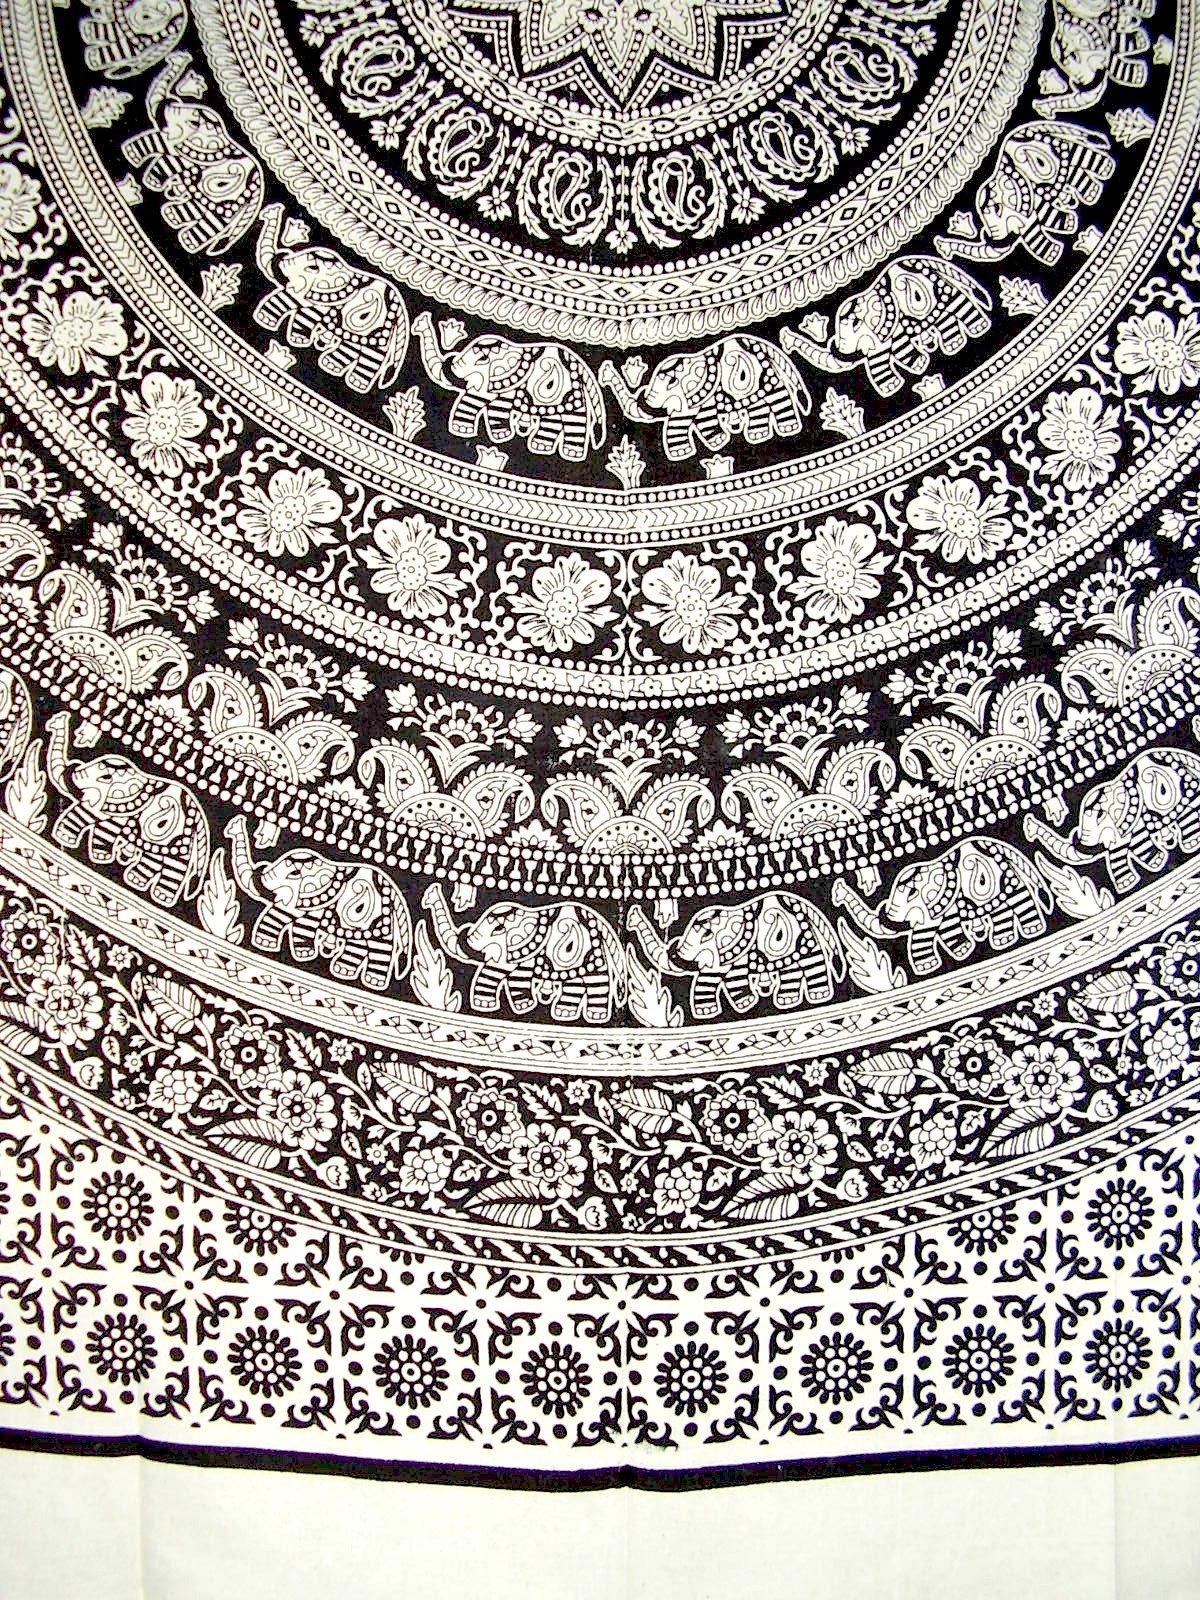 Mandala Elephants Heavy Cotton Bedspread 98'' x 82'' Full White